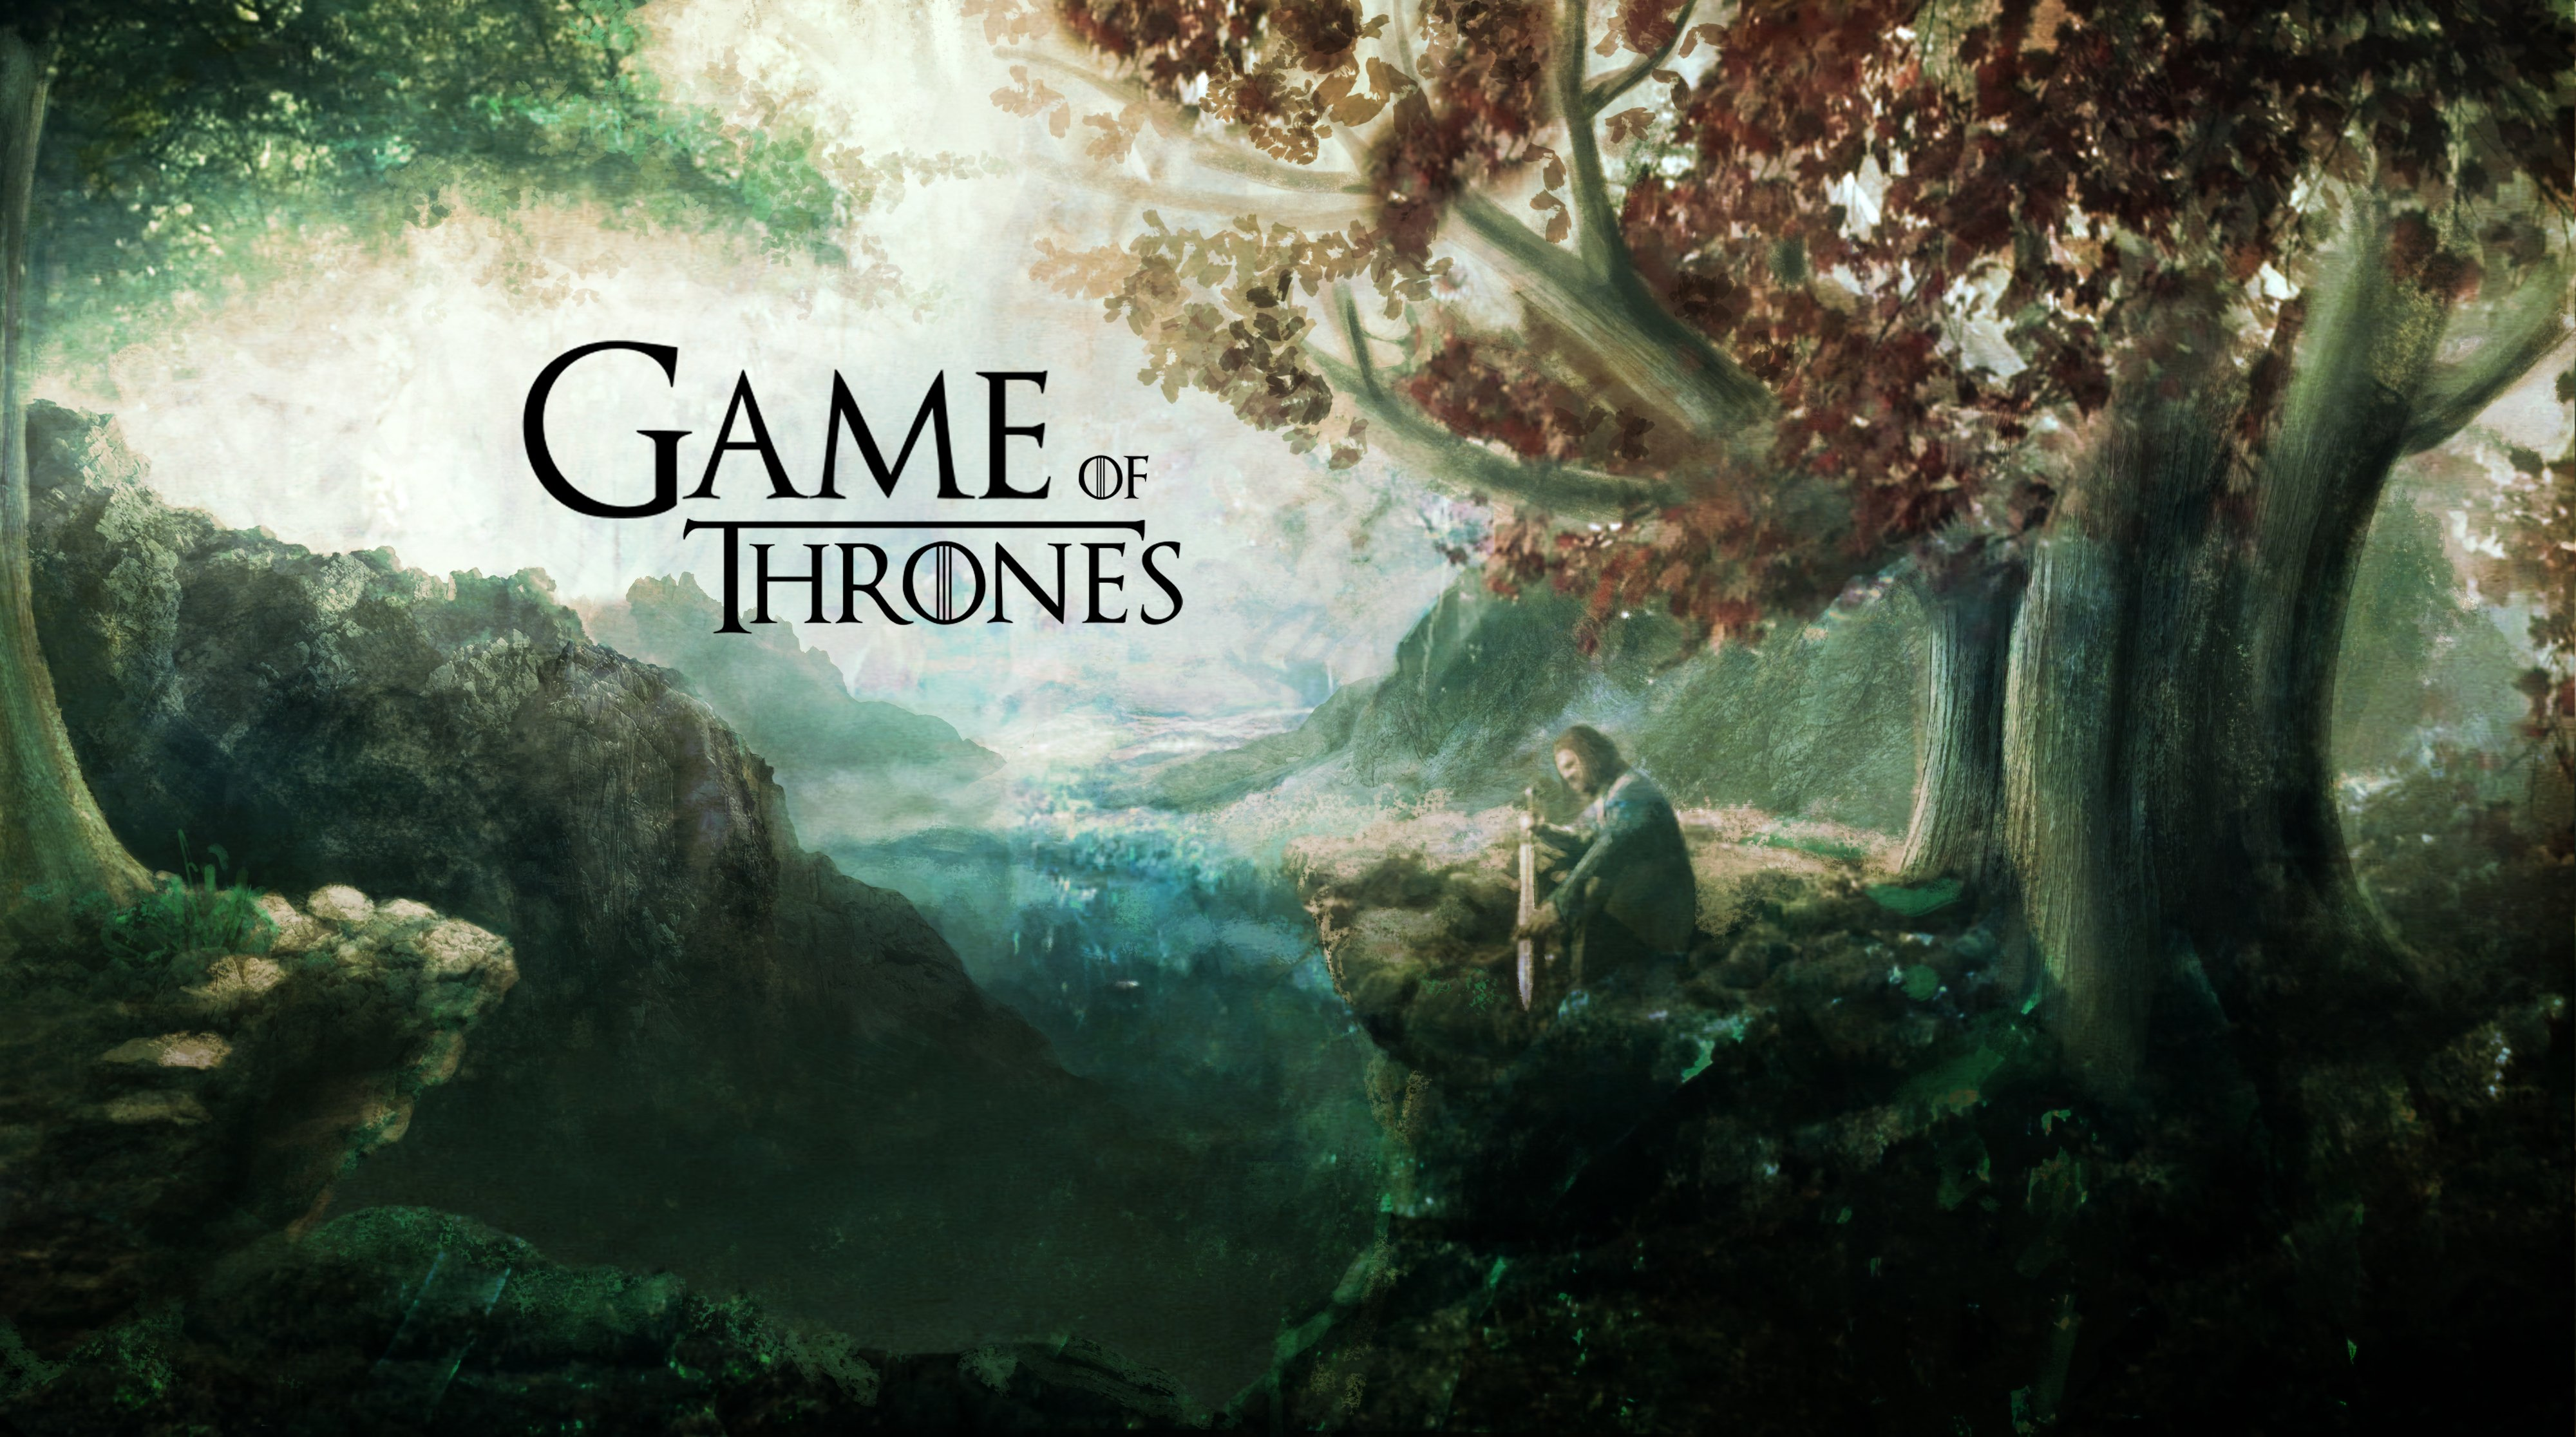 download Download Game Of Thrones Season 3 Wallpaper Full HD 4000x2231